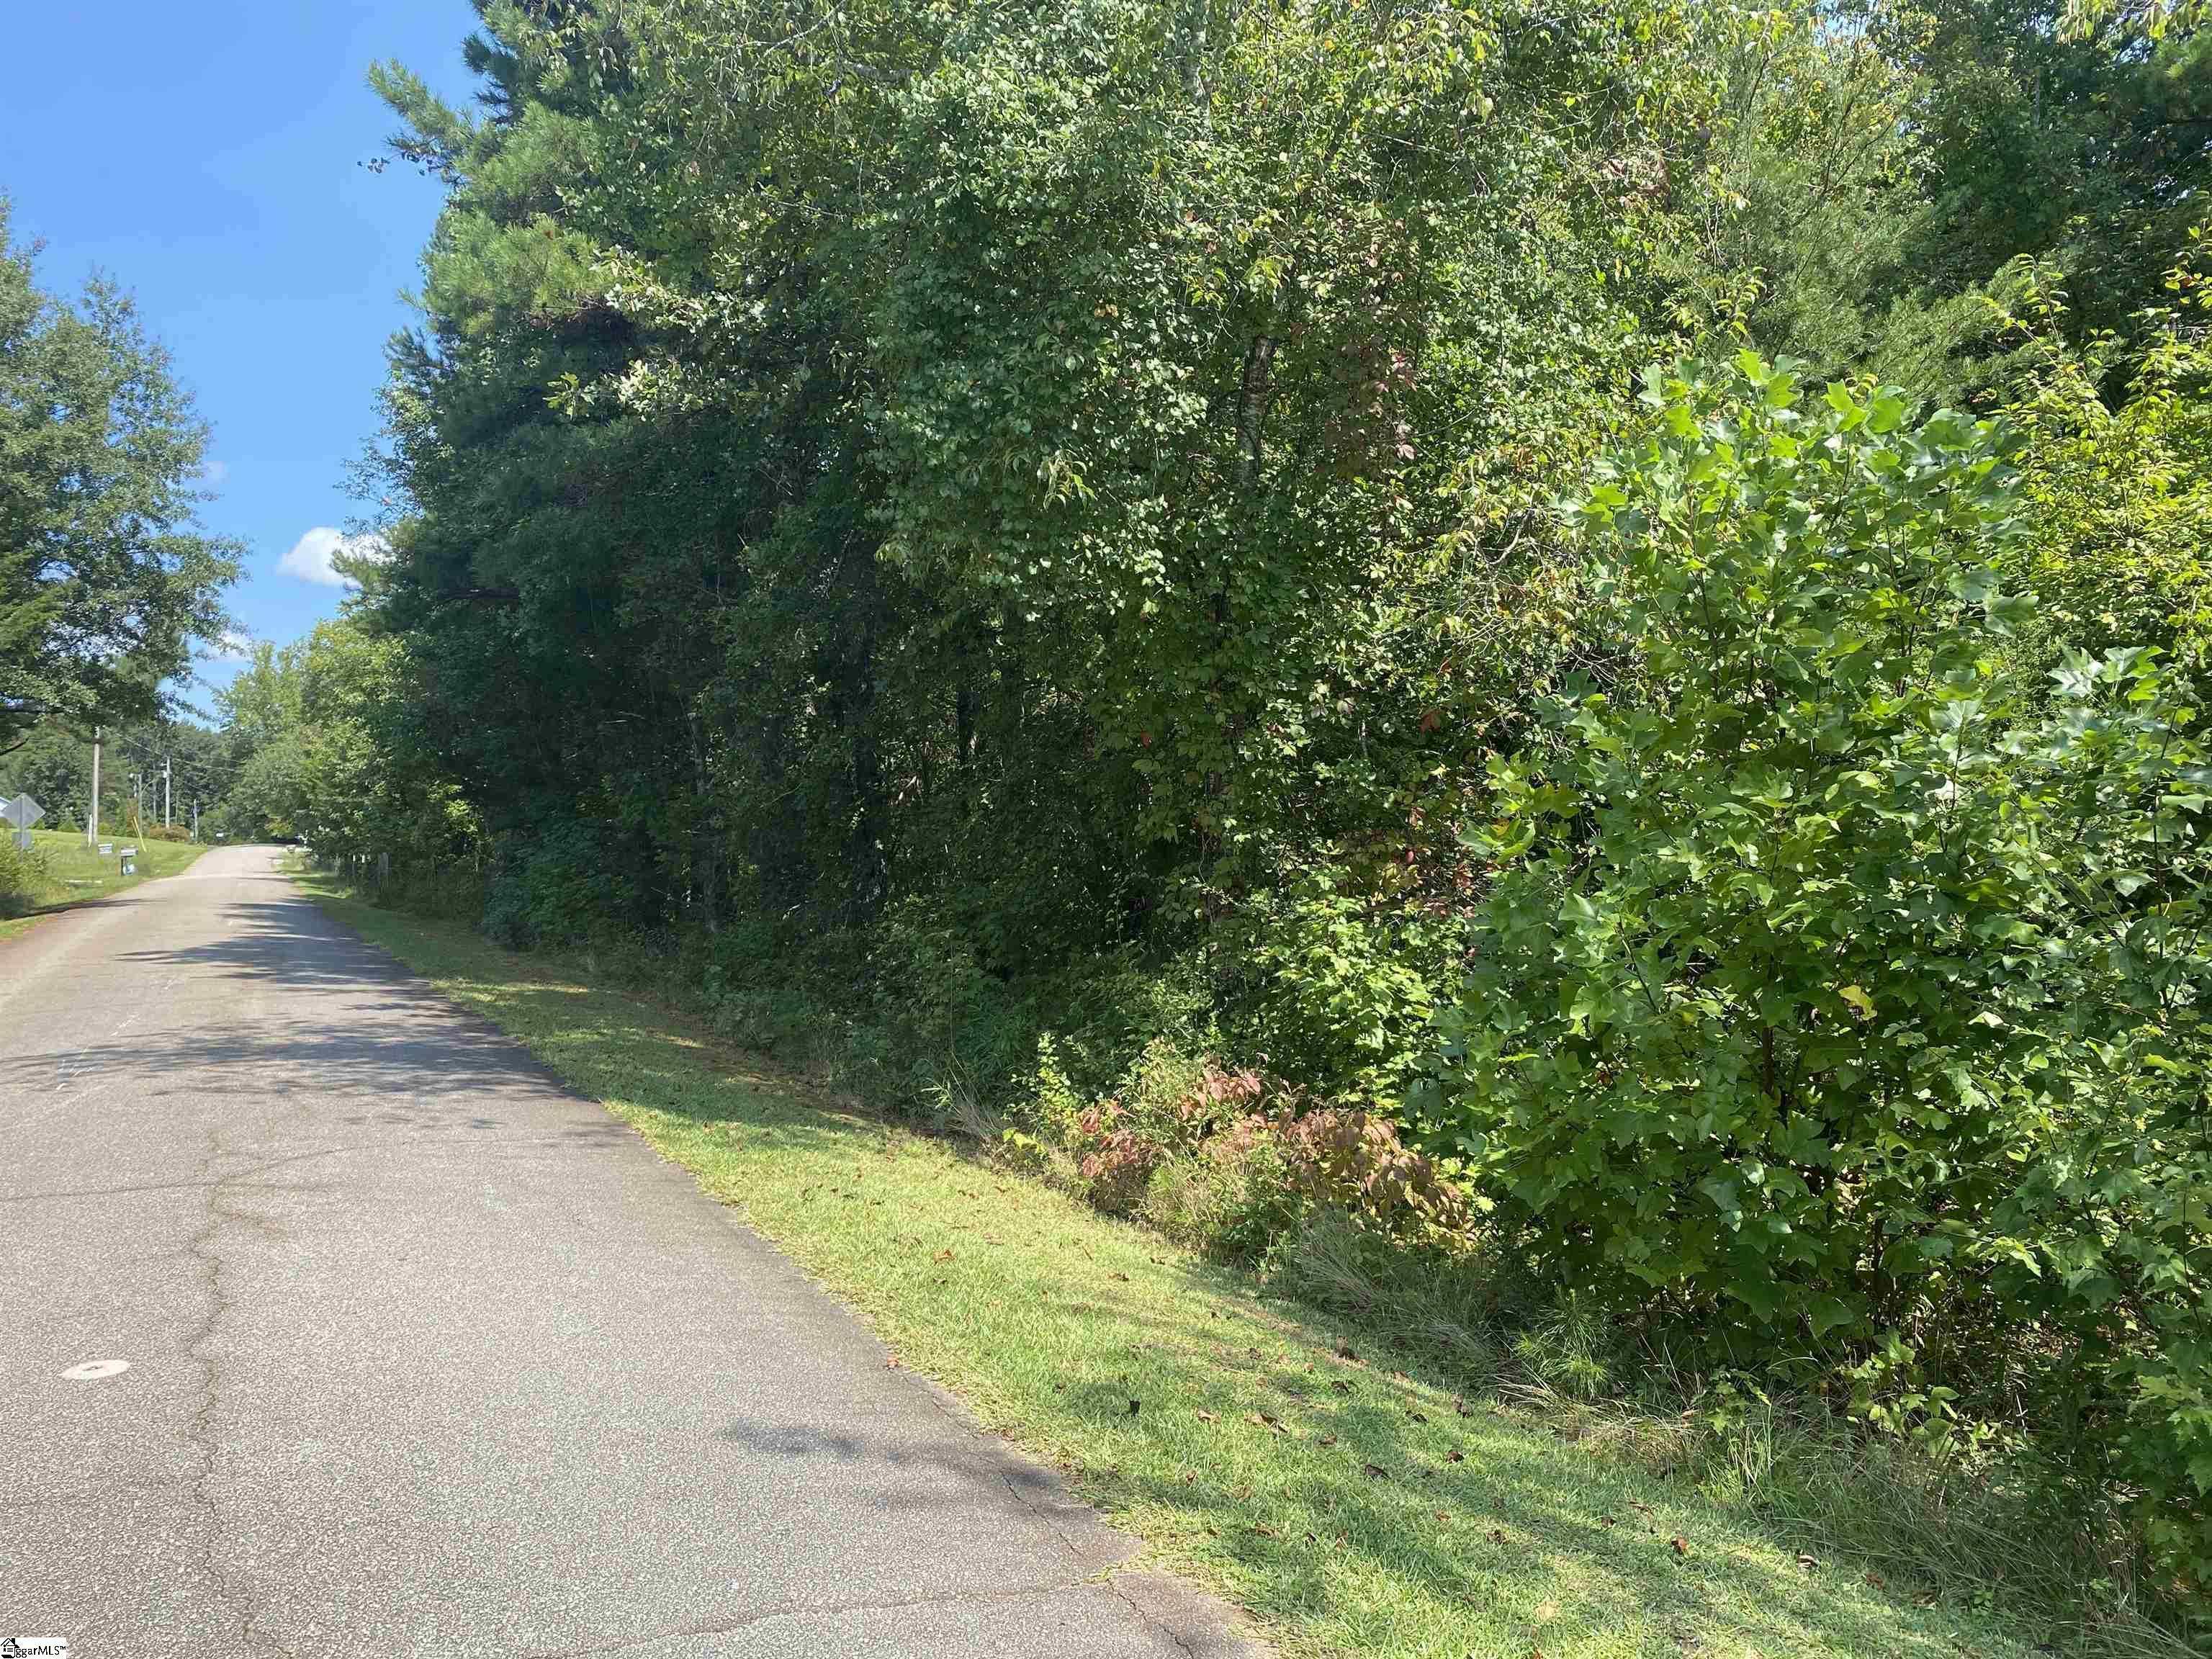 000 Windtree, Pickens, SC 29671